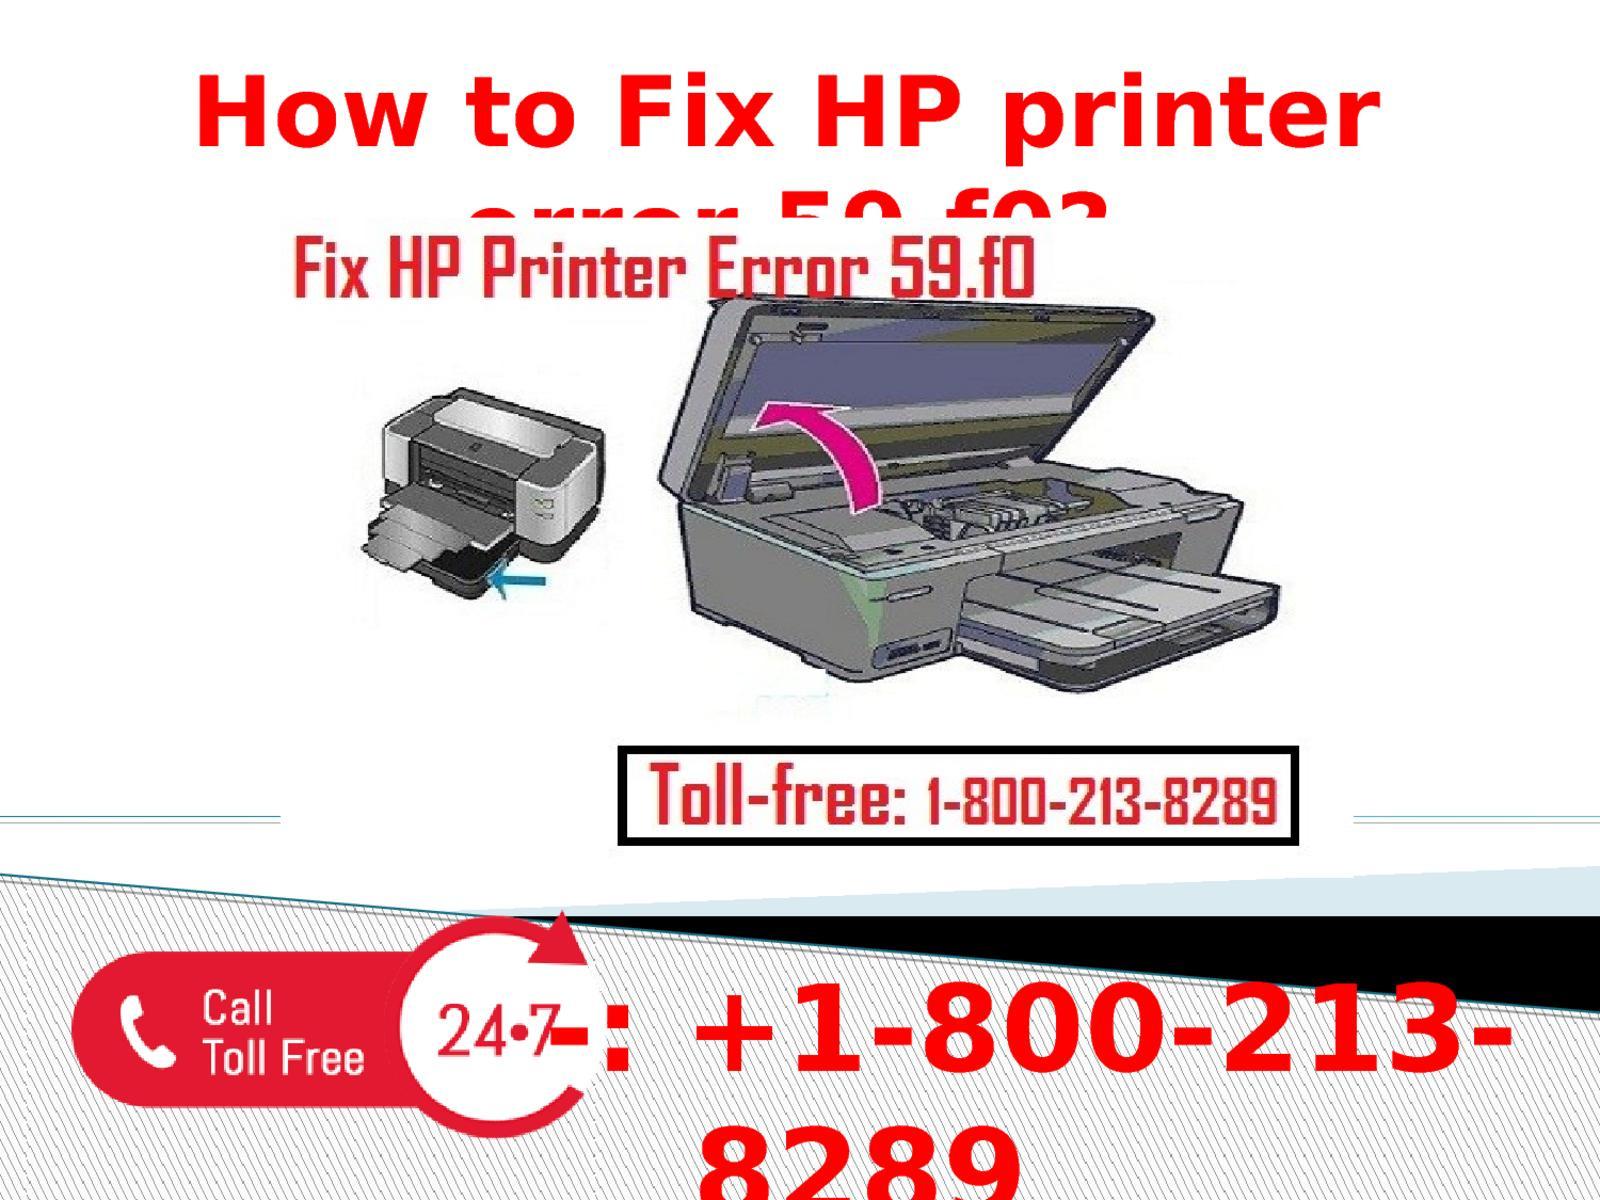 1-800-213-8289 Fix HP printer error 59 f0